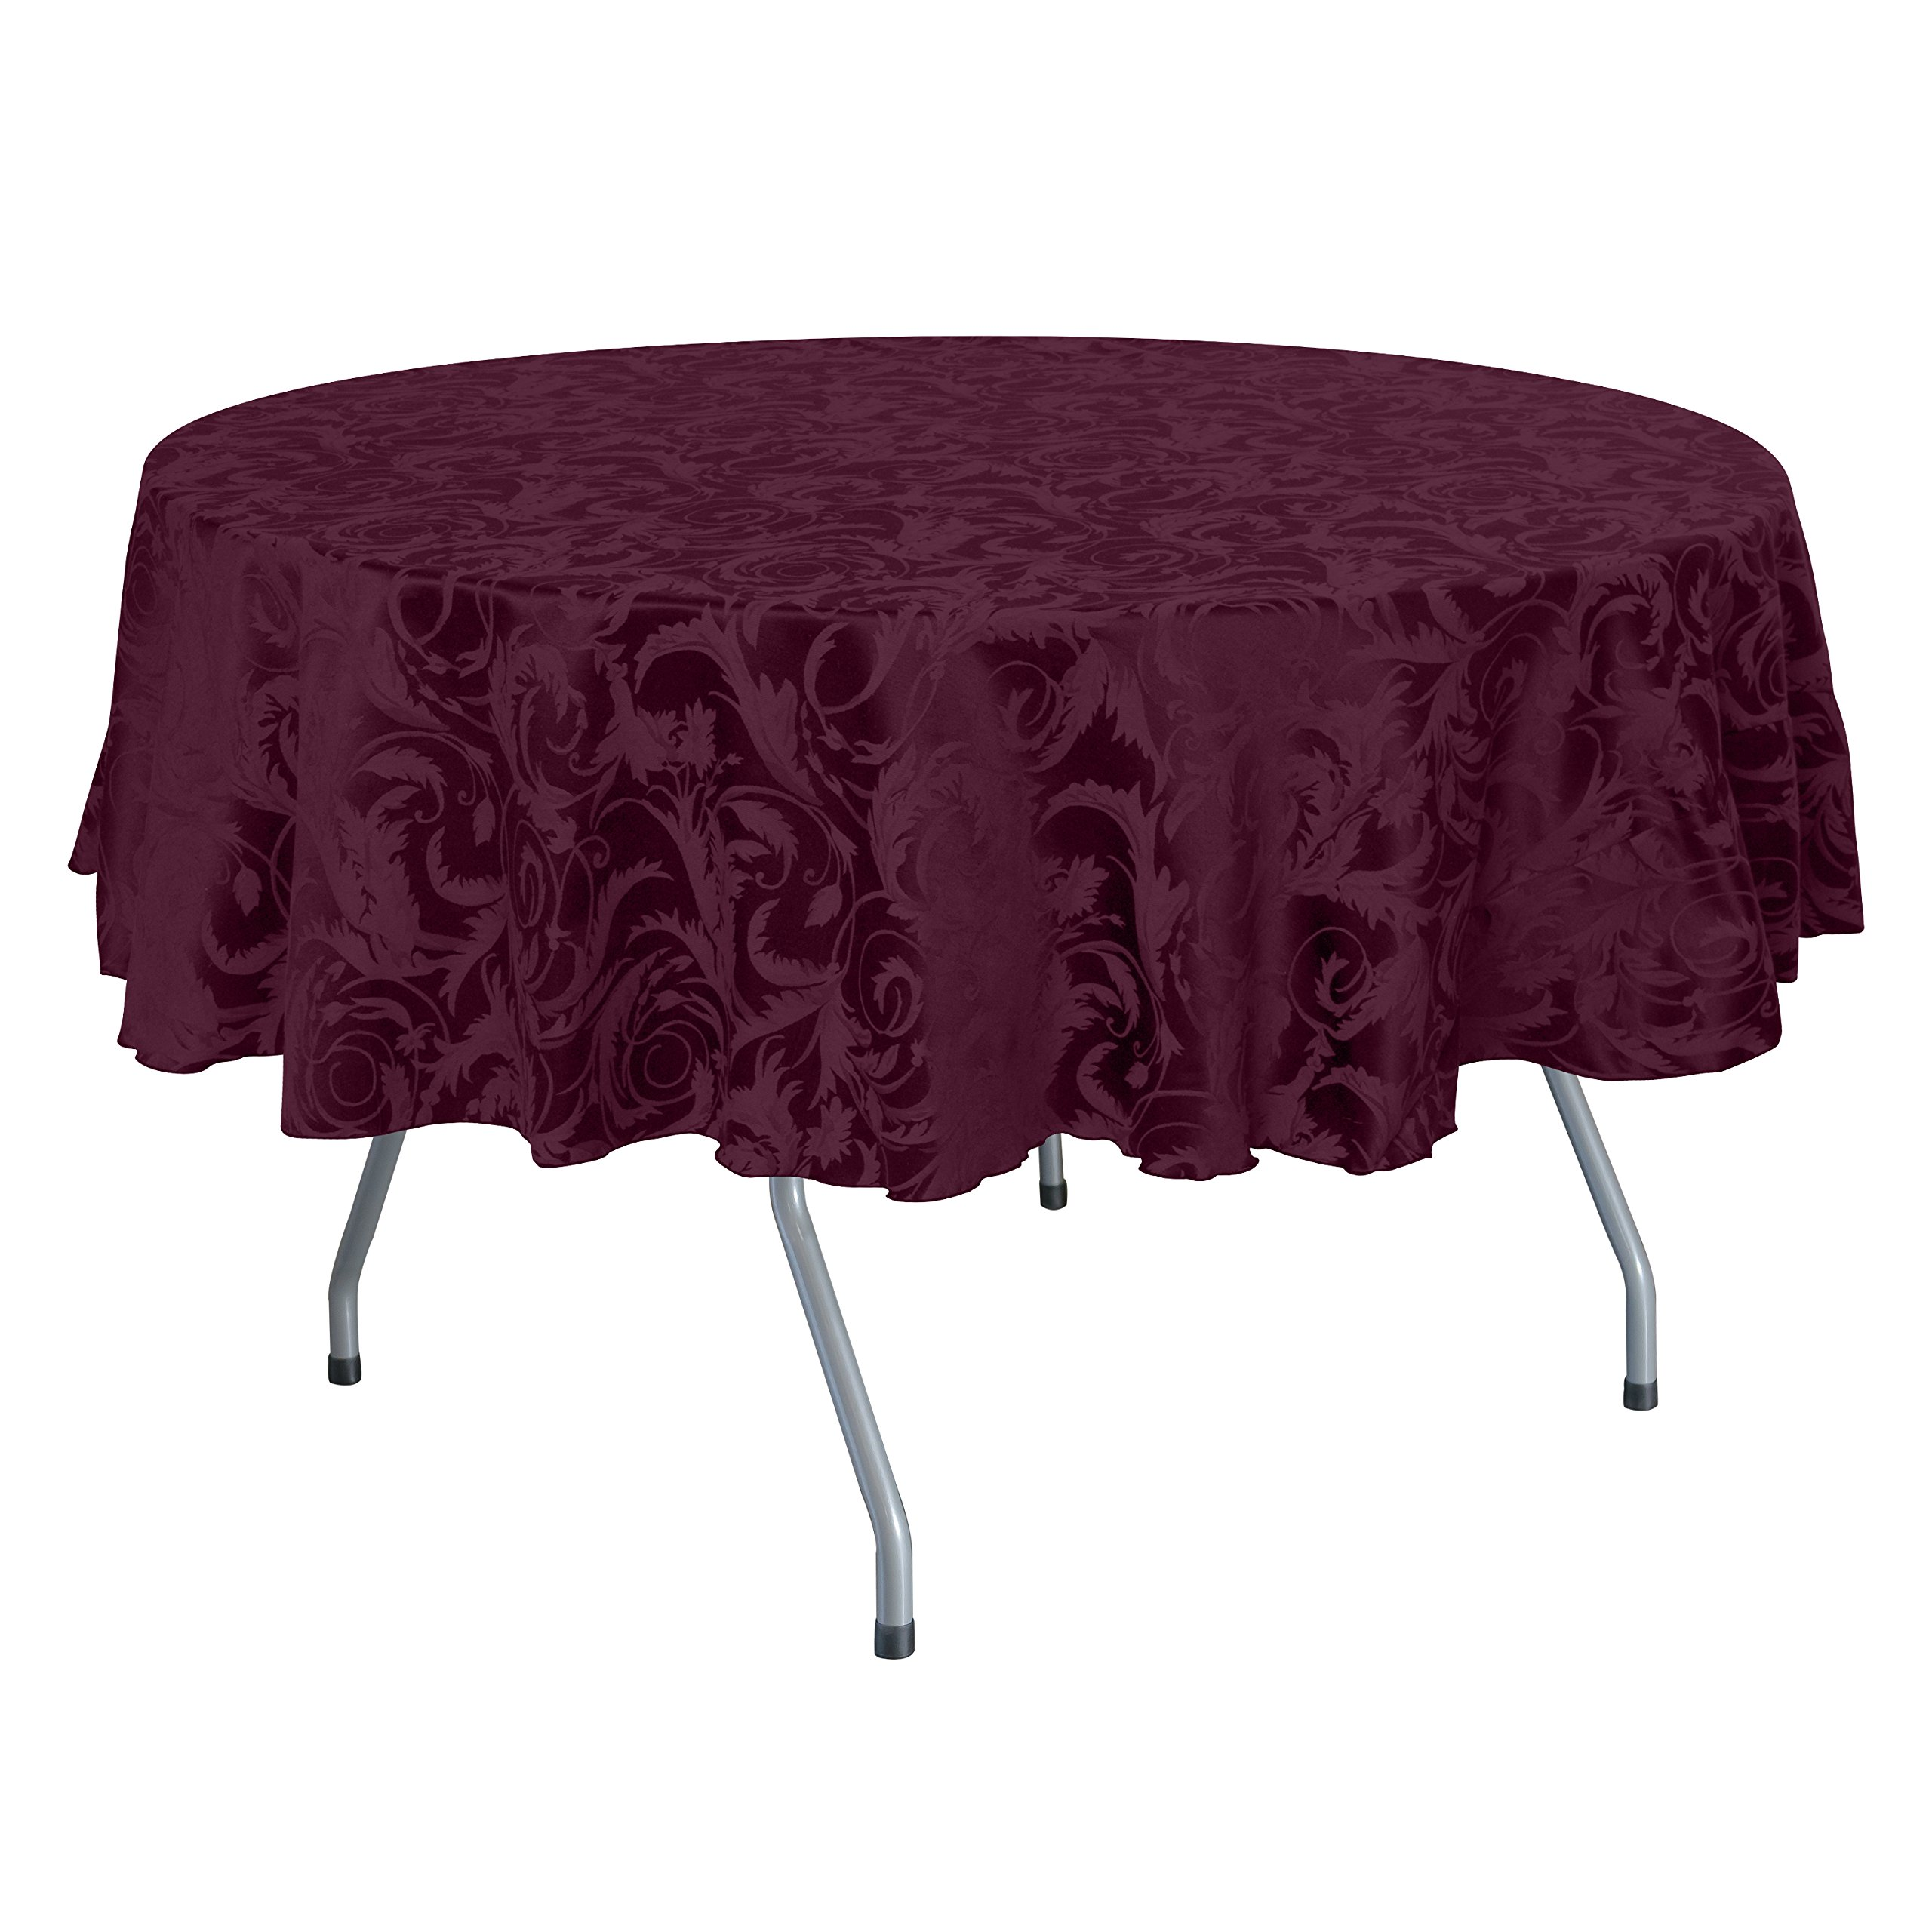 Ultimate Textile (5 Pack) Damask Melrose 60 x 120 Inch Oval Tablecloth - Home Dining Collection - Floral Leaf Scroll Jacquard Design, Burgundy